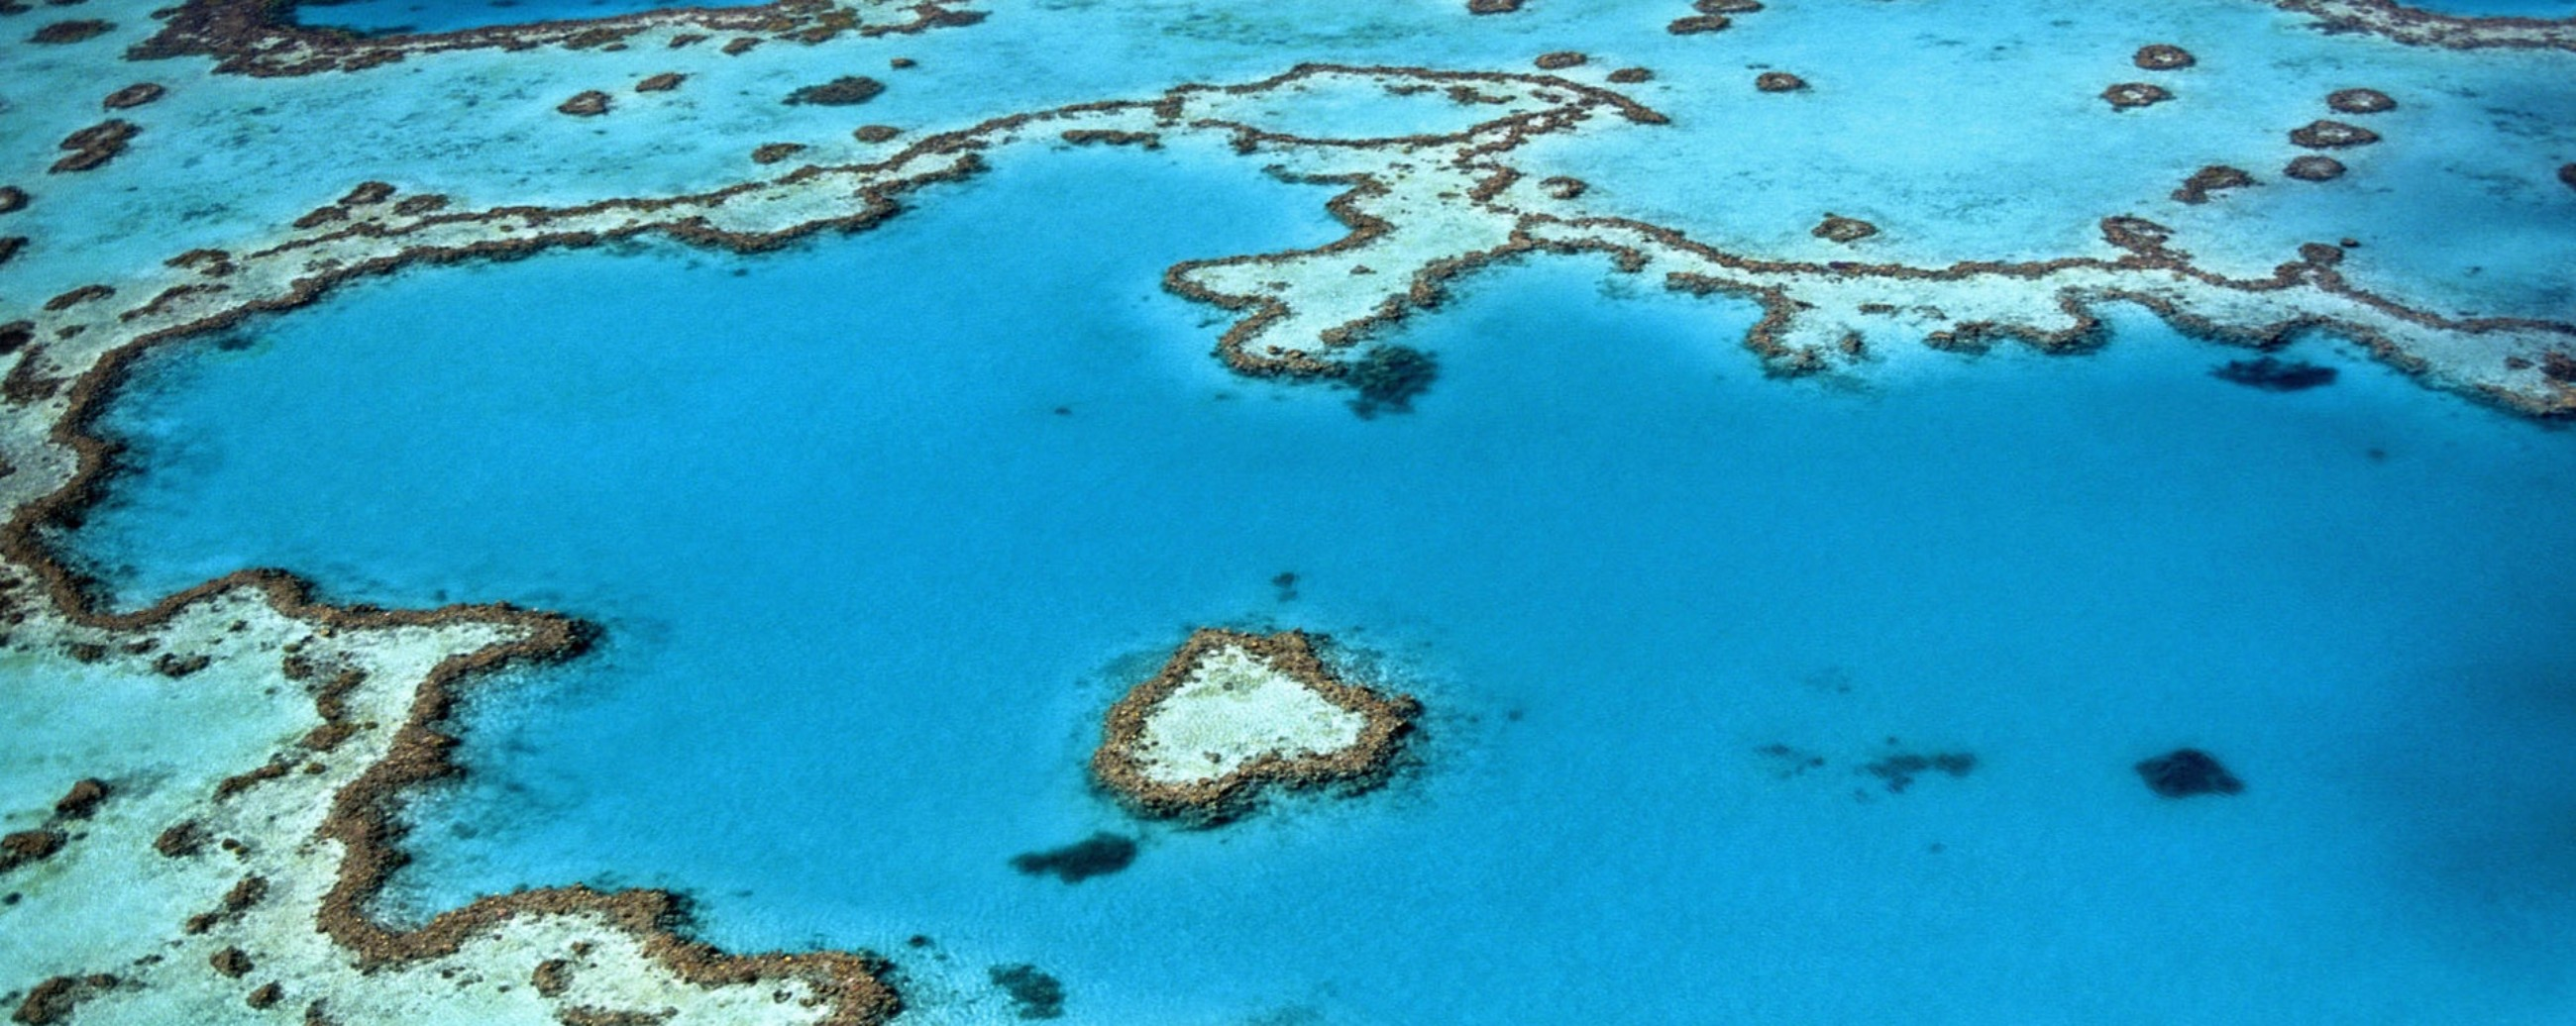 great barrier reef header2